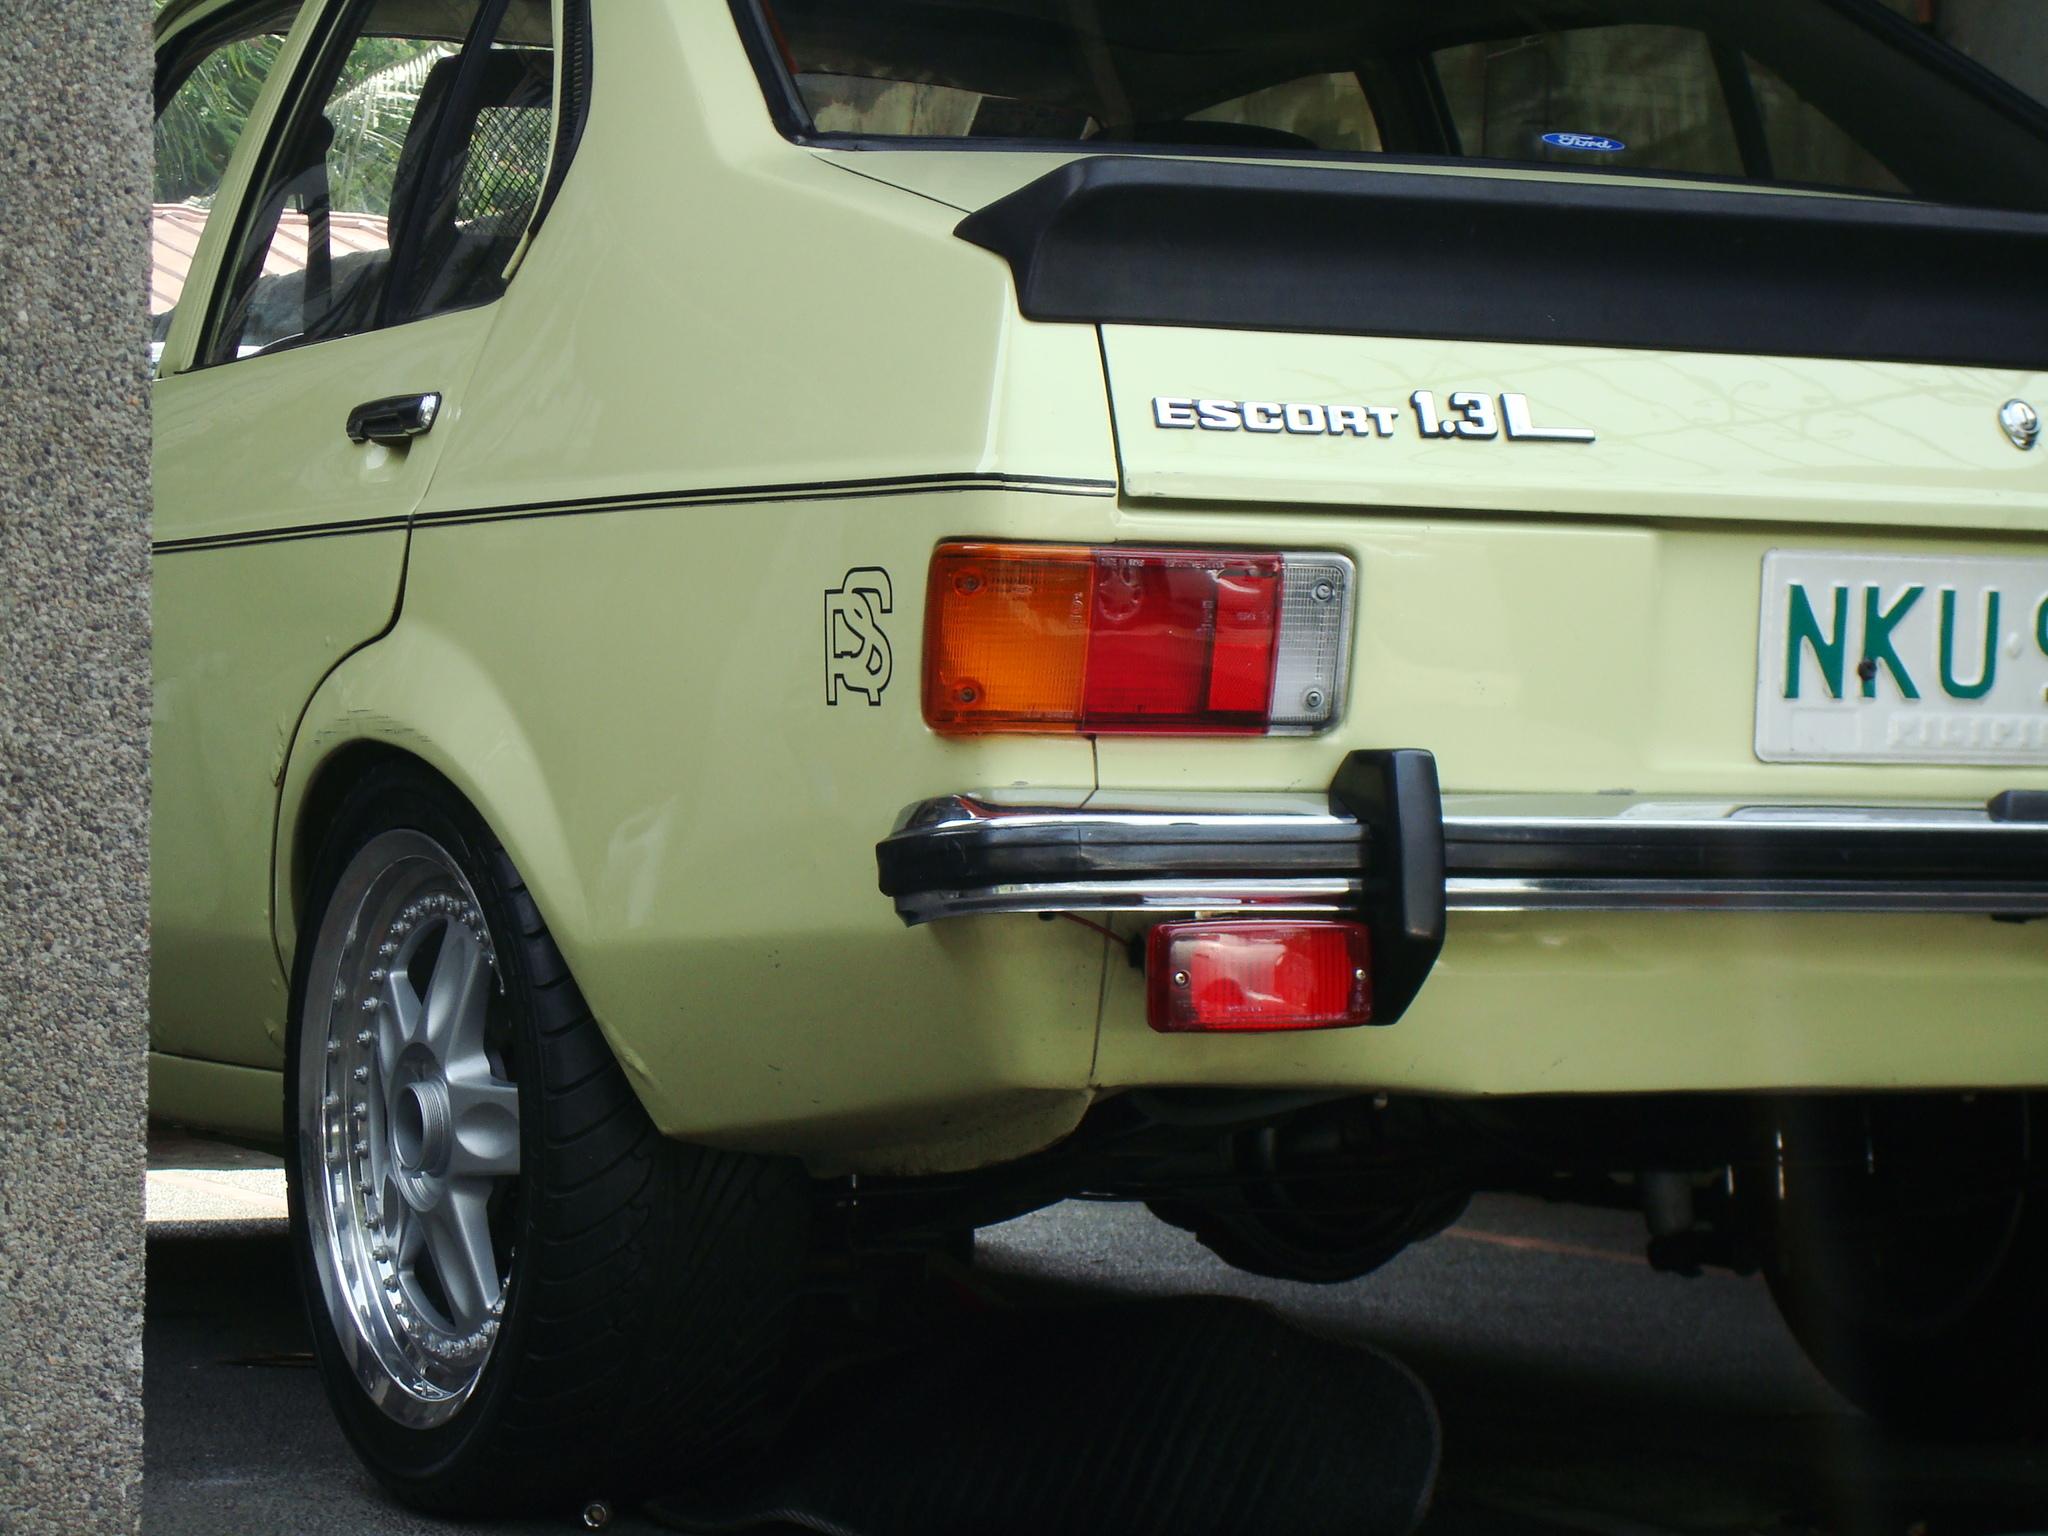 Mitsubishi Lancer I 1973 - 1985 Coupe #4